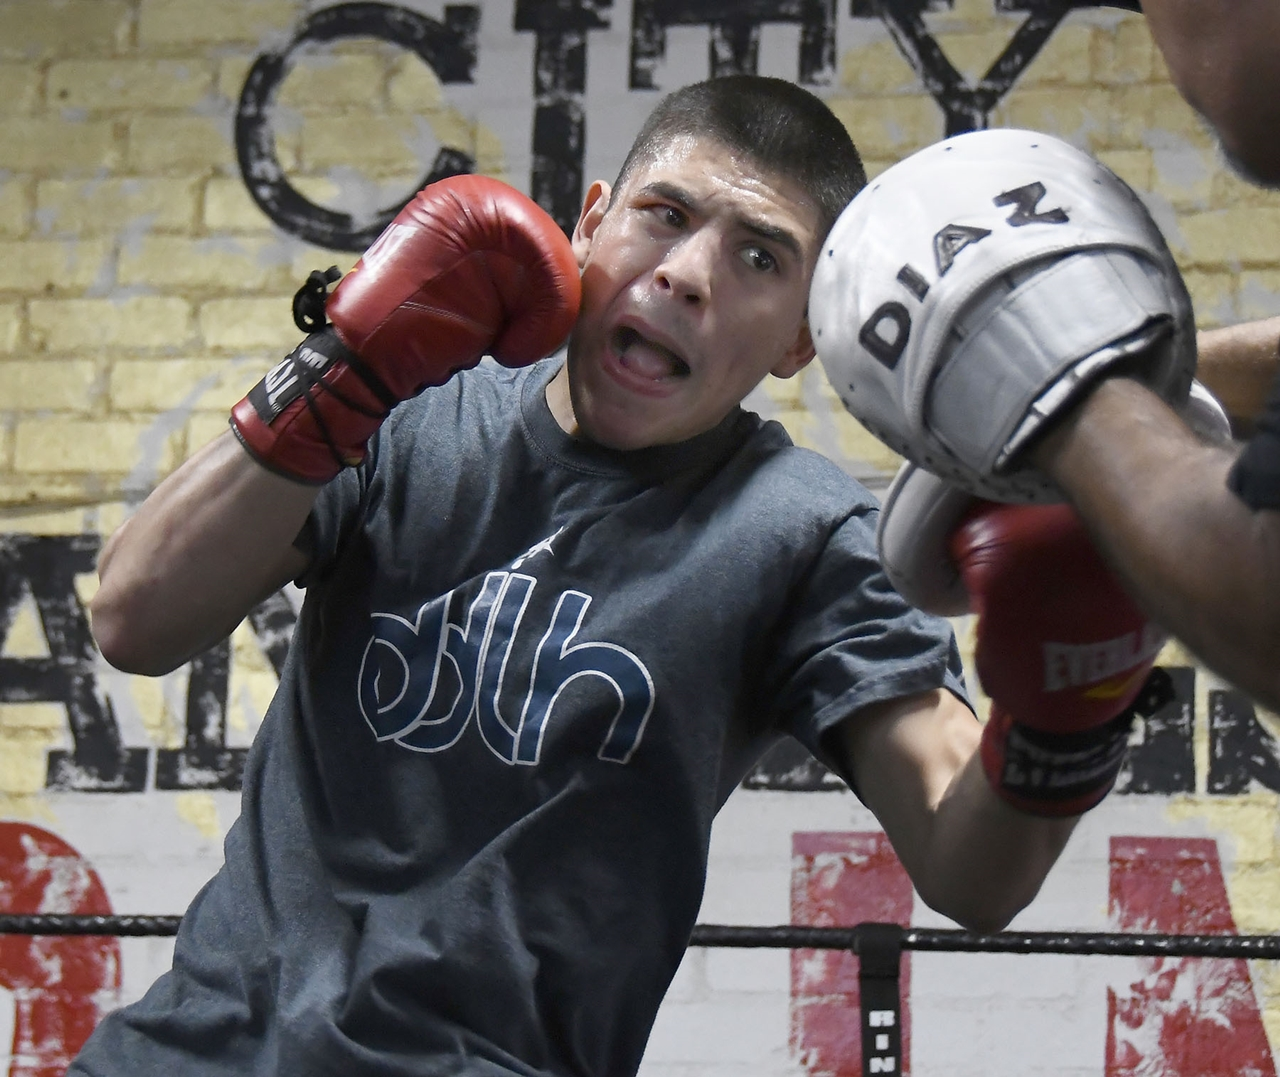 Canelo Vs. Smith Undercard Fighters Prepare For Sept. 17